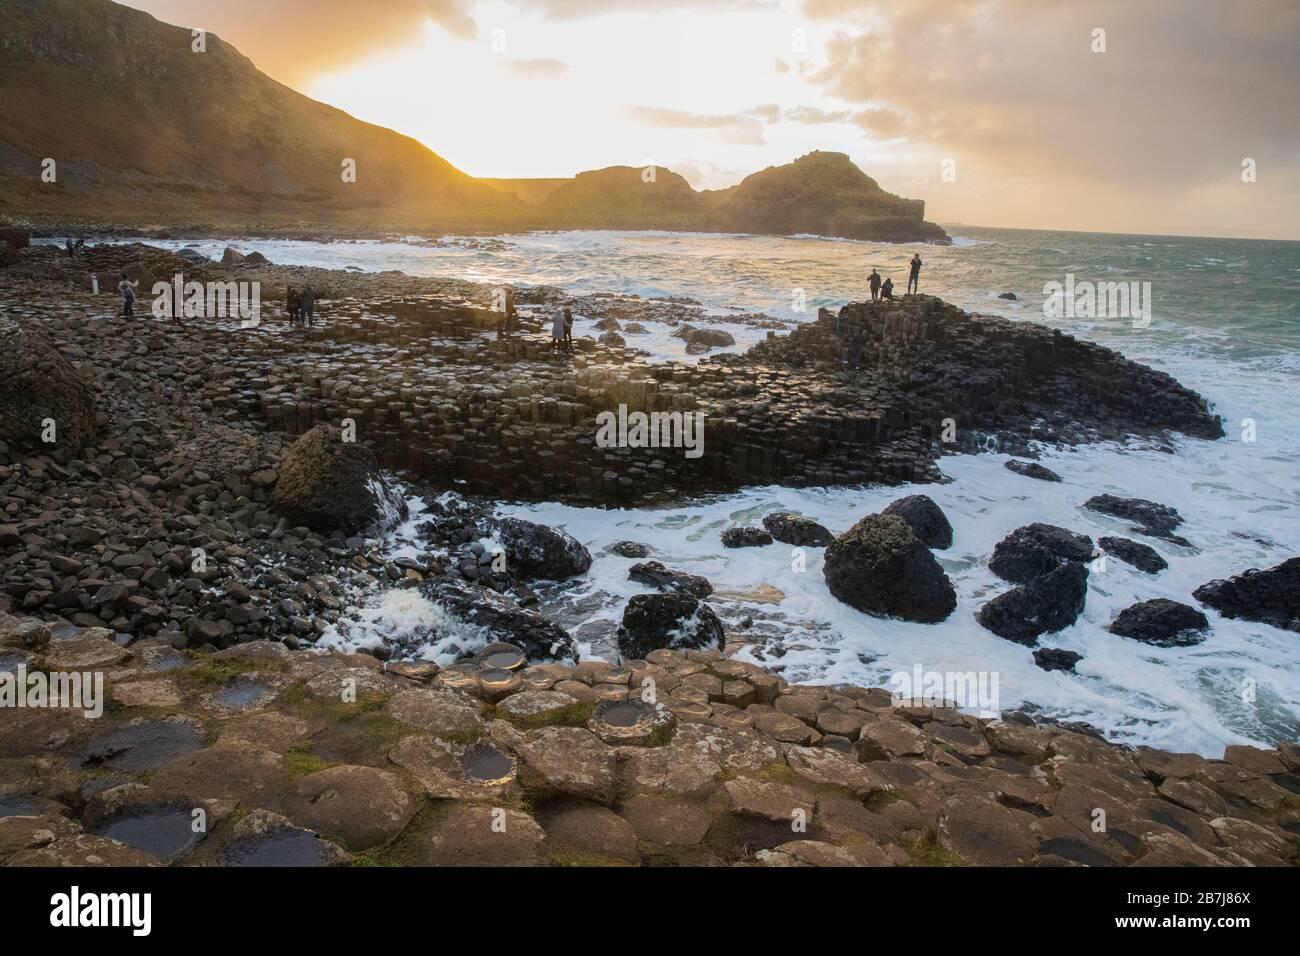 Amazing Giant's Causeway, Co. Antrim, Northern Ireland Stock Photo